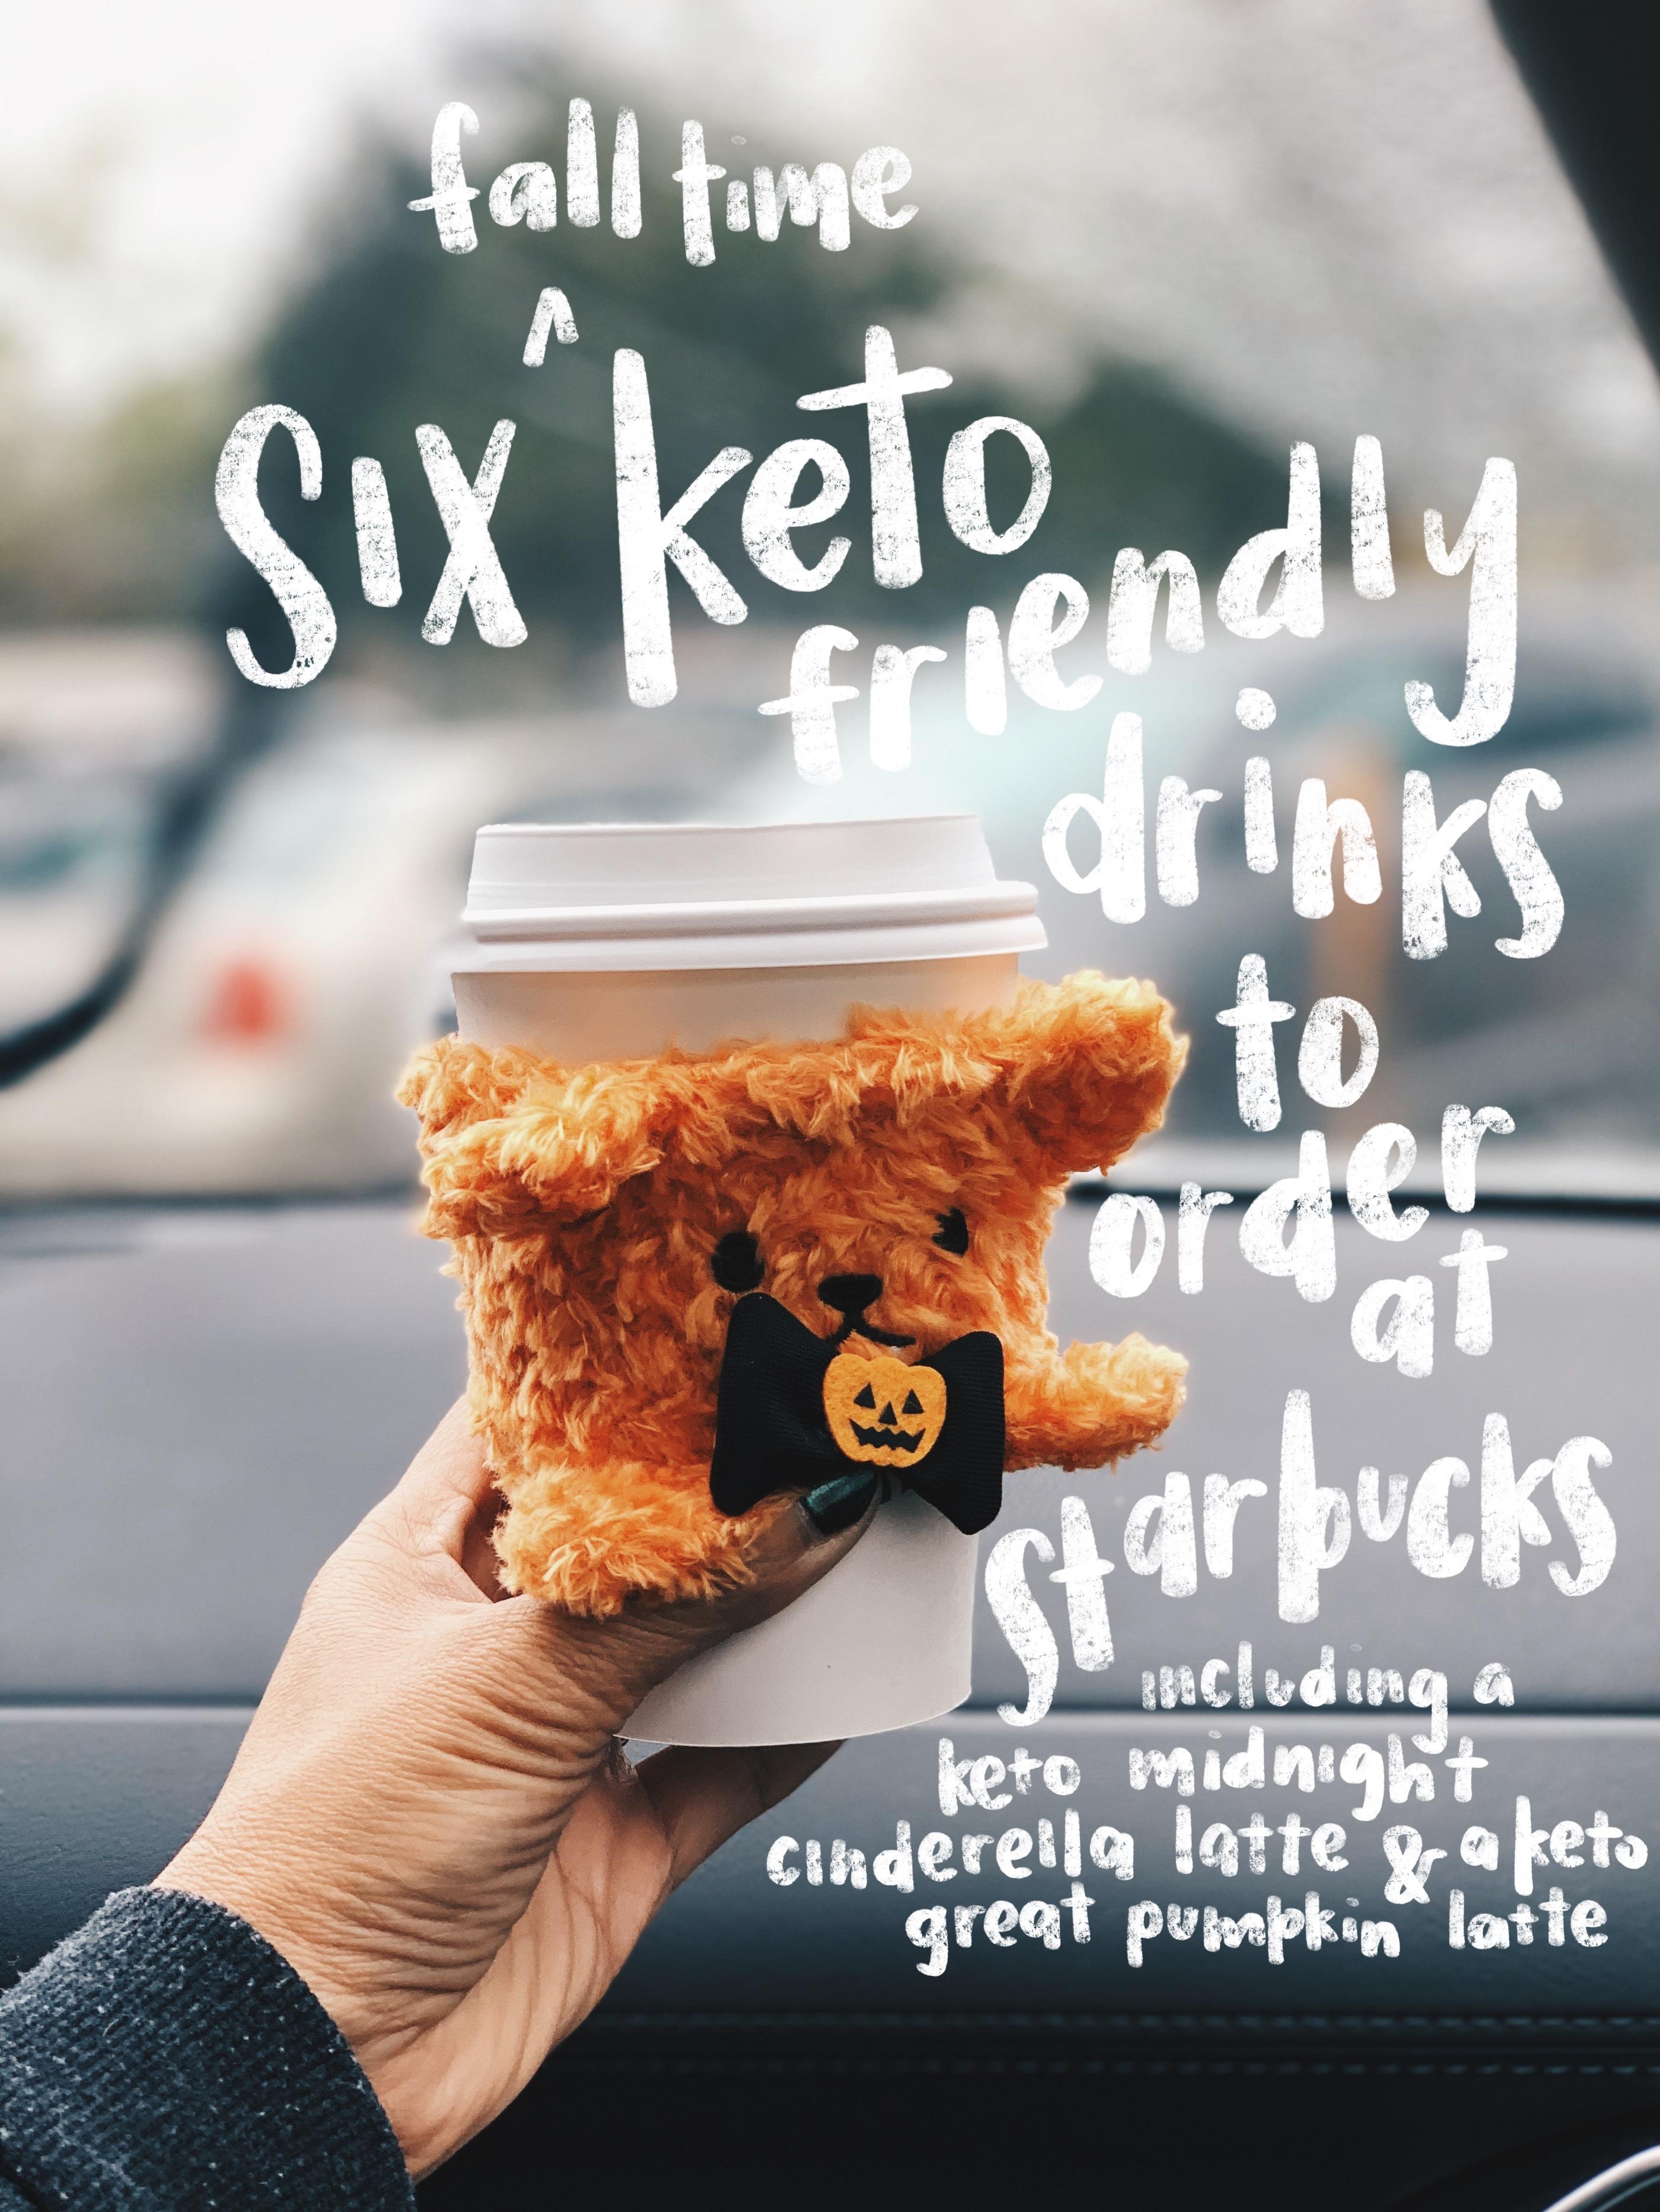 keto friendly starbucks drinks